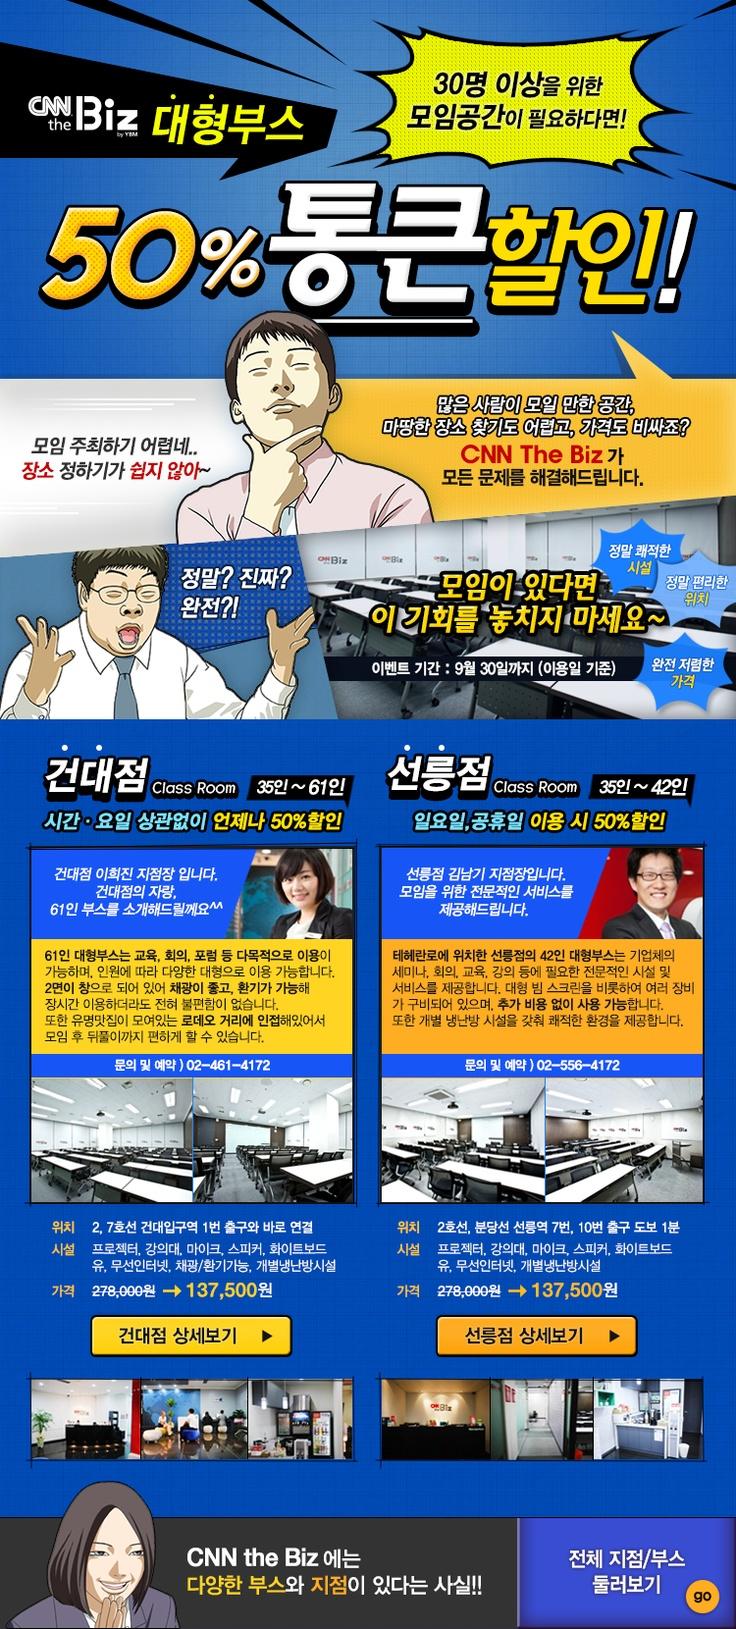 [CNN the Biz] 건대 선릉 대형부스 할인 이벤트 (김수연)